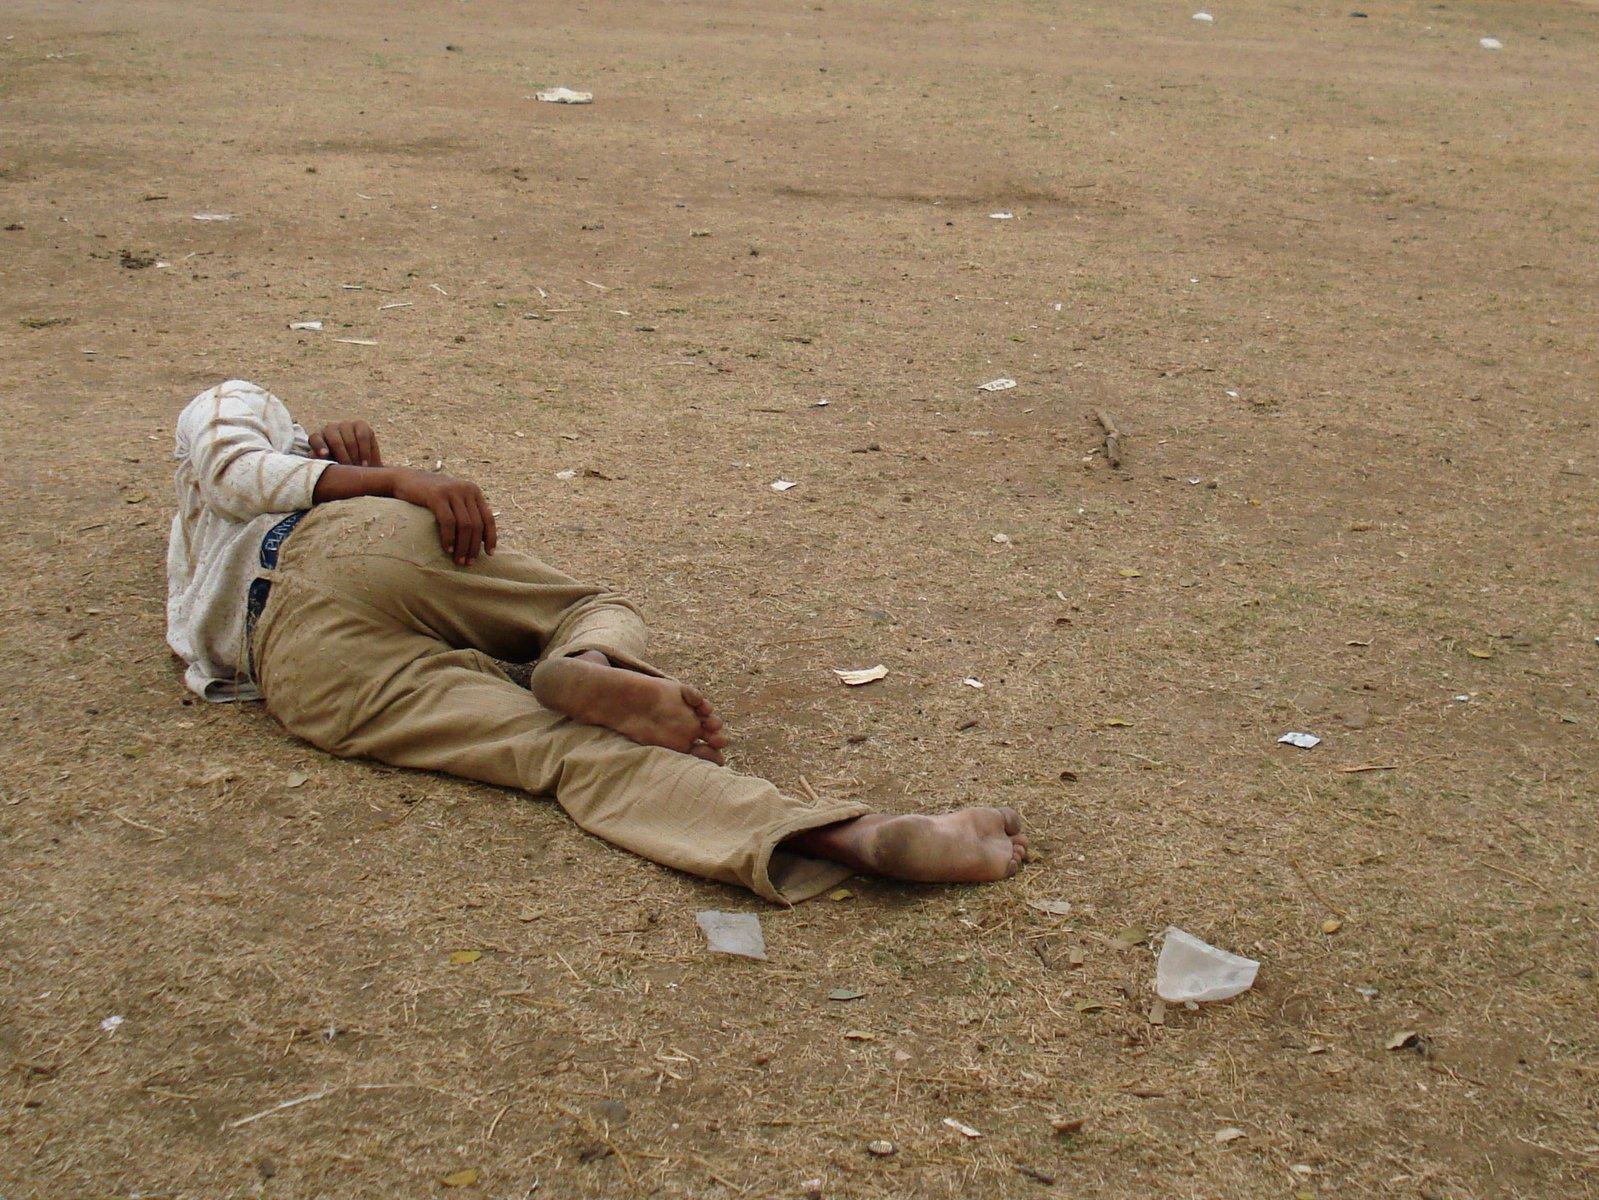 Slapen Op Grond : Free man slapen op de grond stock photo freeimages.com